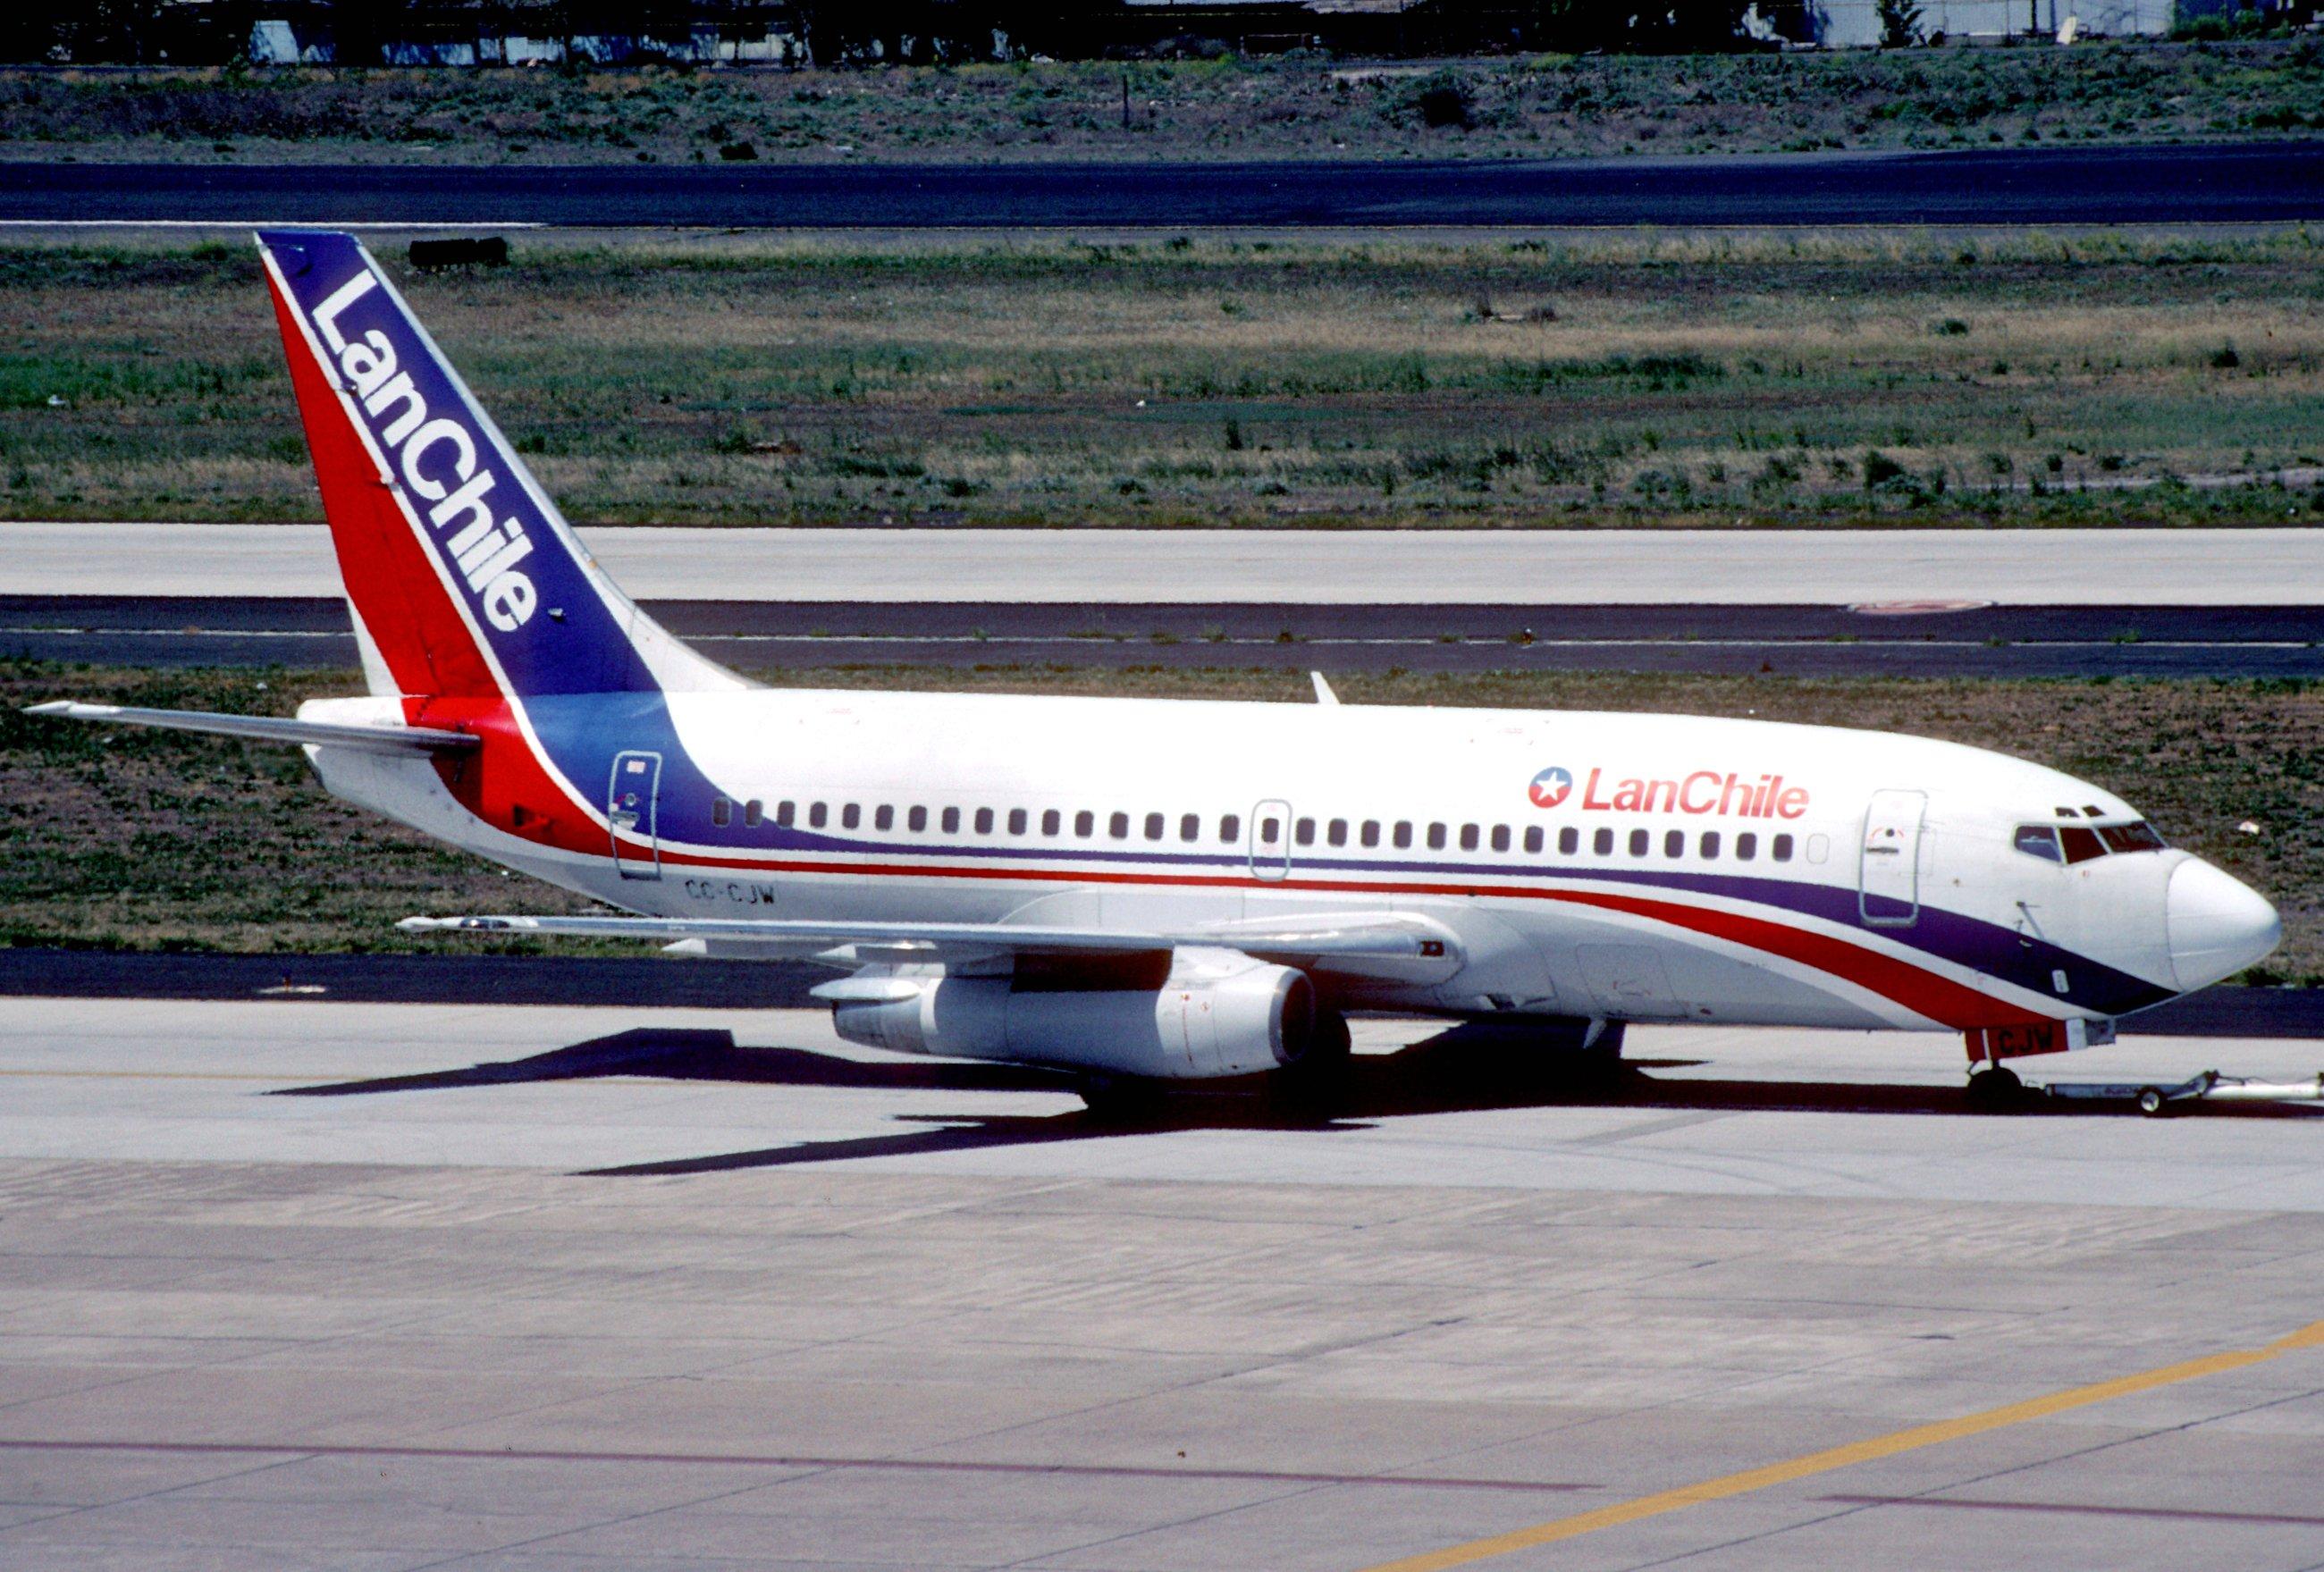 LAN_Chile_Boeing_737-2T5%3B_CC-CJW%40SCL